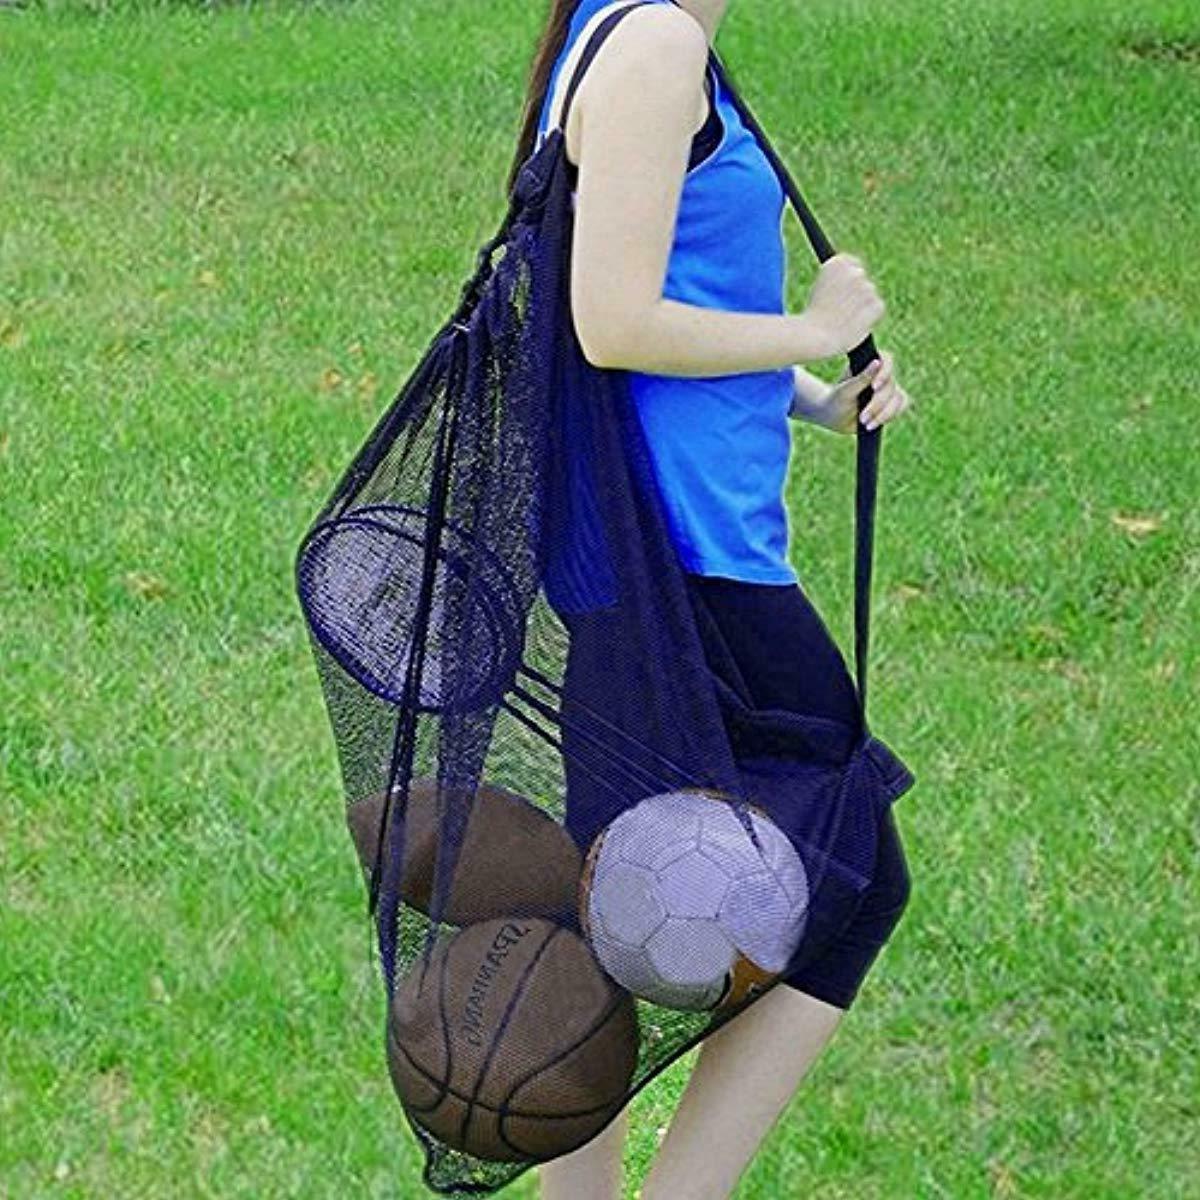 HEAVY MESH EQUIPMENT SOCCER. FOOTBALL. 4